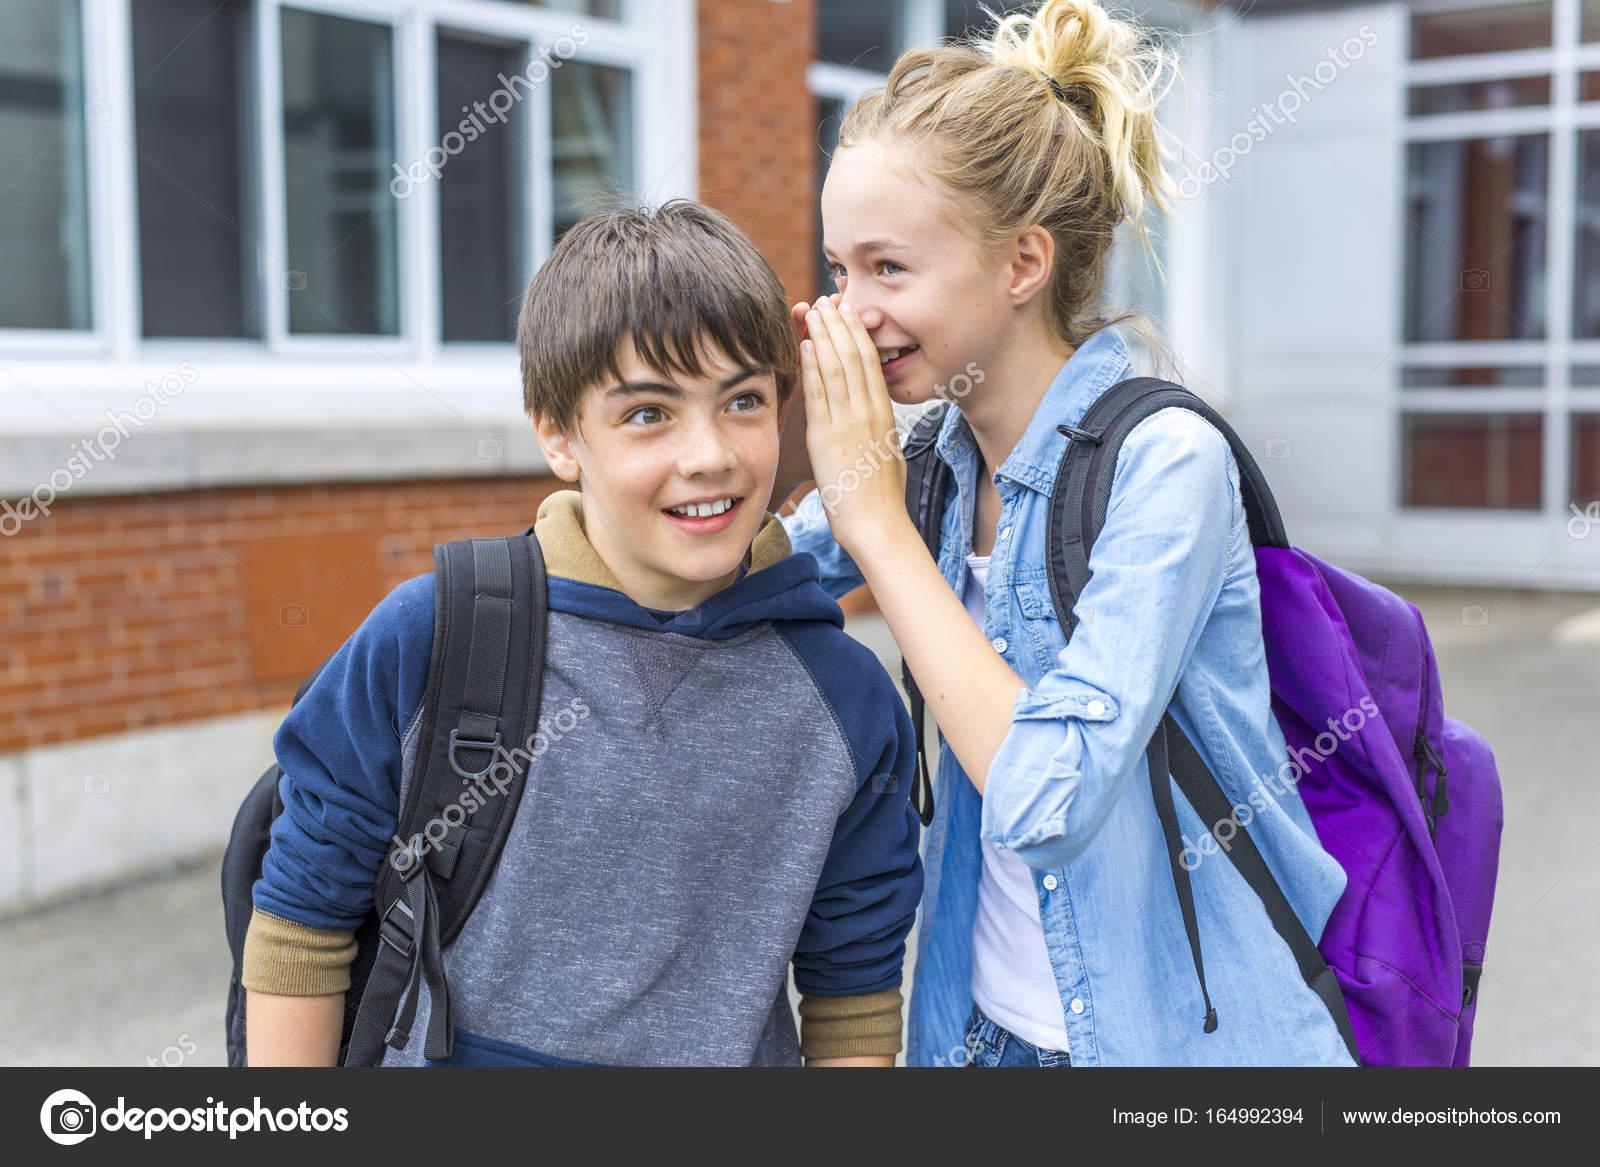 f22c8380c69 Ένα πορτρέτο του σχολείου 10 ετών αγόρι και κορίτσι Διασκεδάζοντας έξω — Εικόνα  από ...